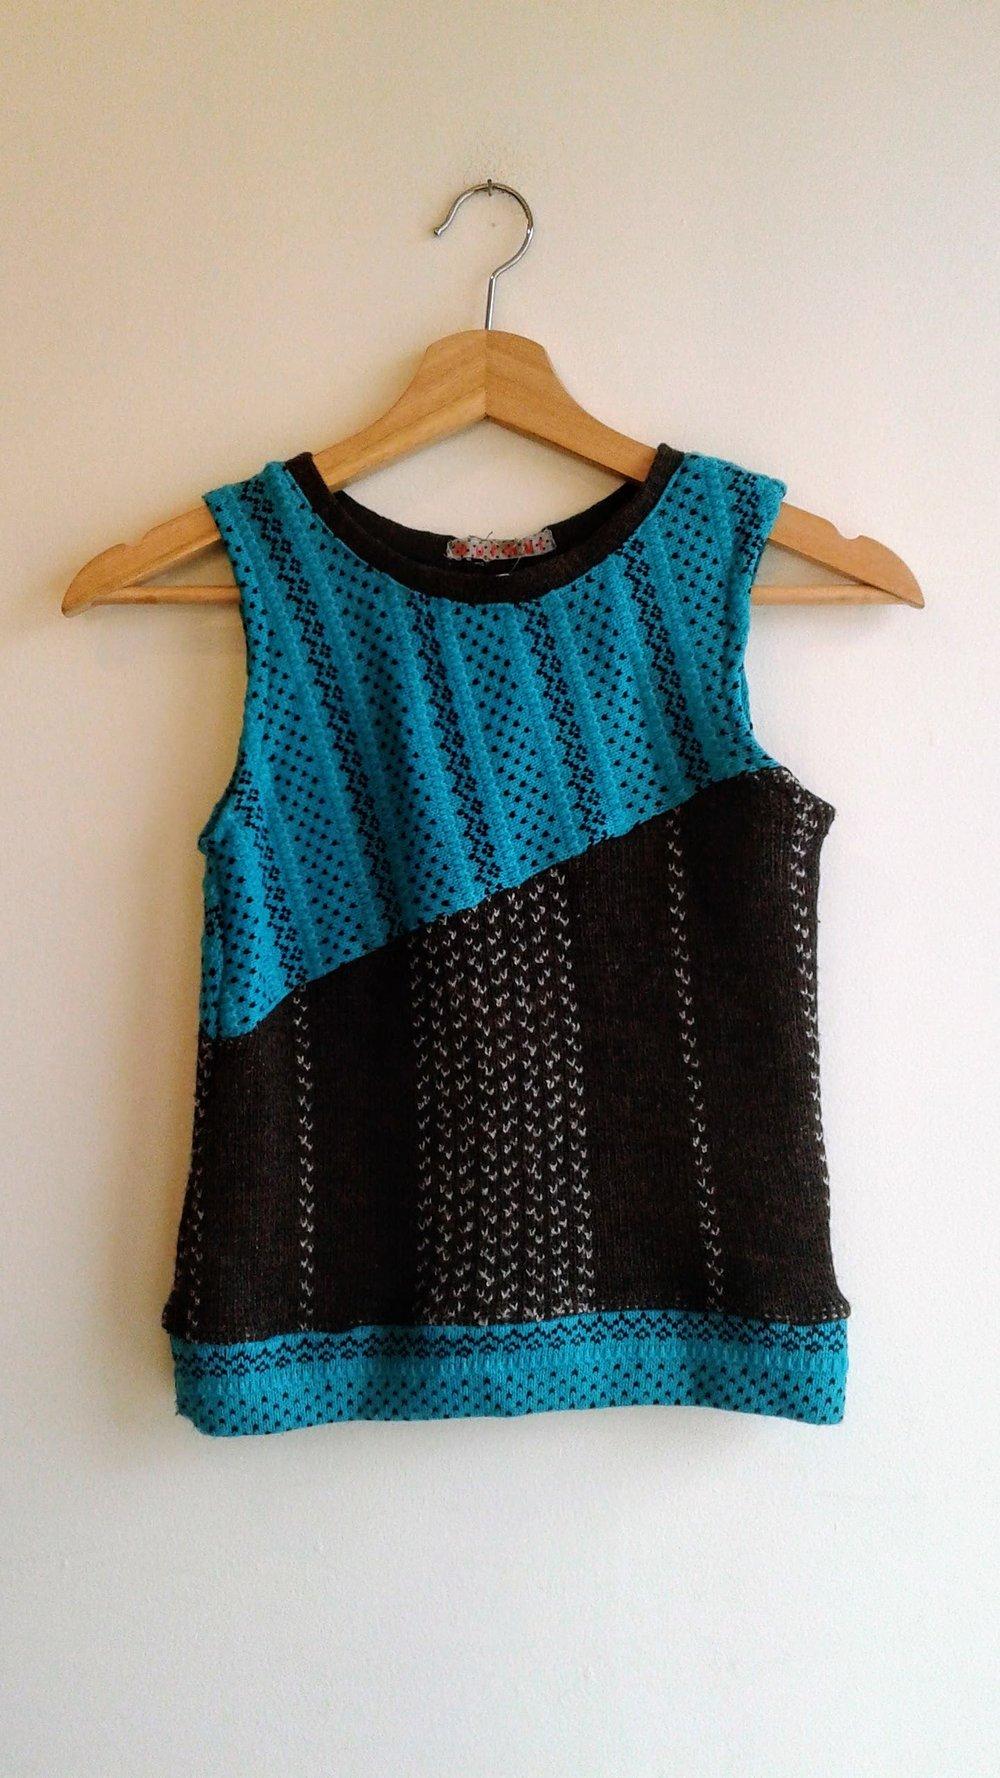 Murmur top; Size Size XS, $20